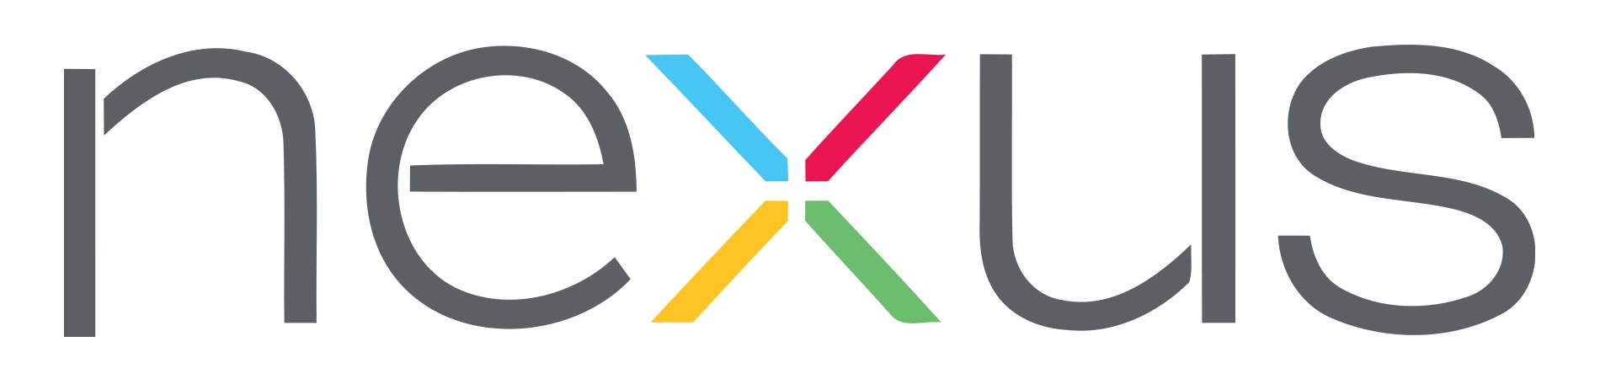 Android Google LG nexus Nexus 6